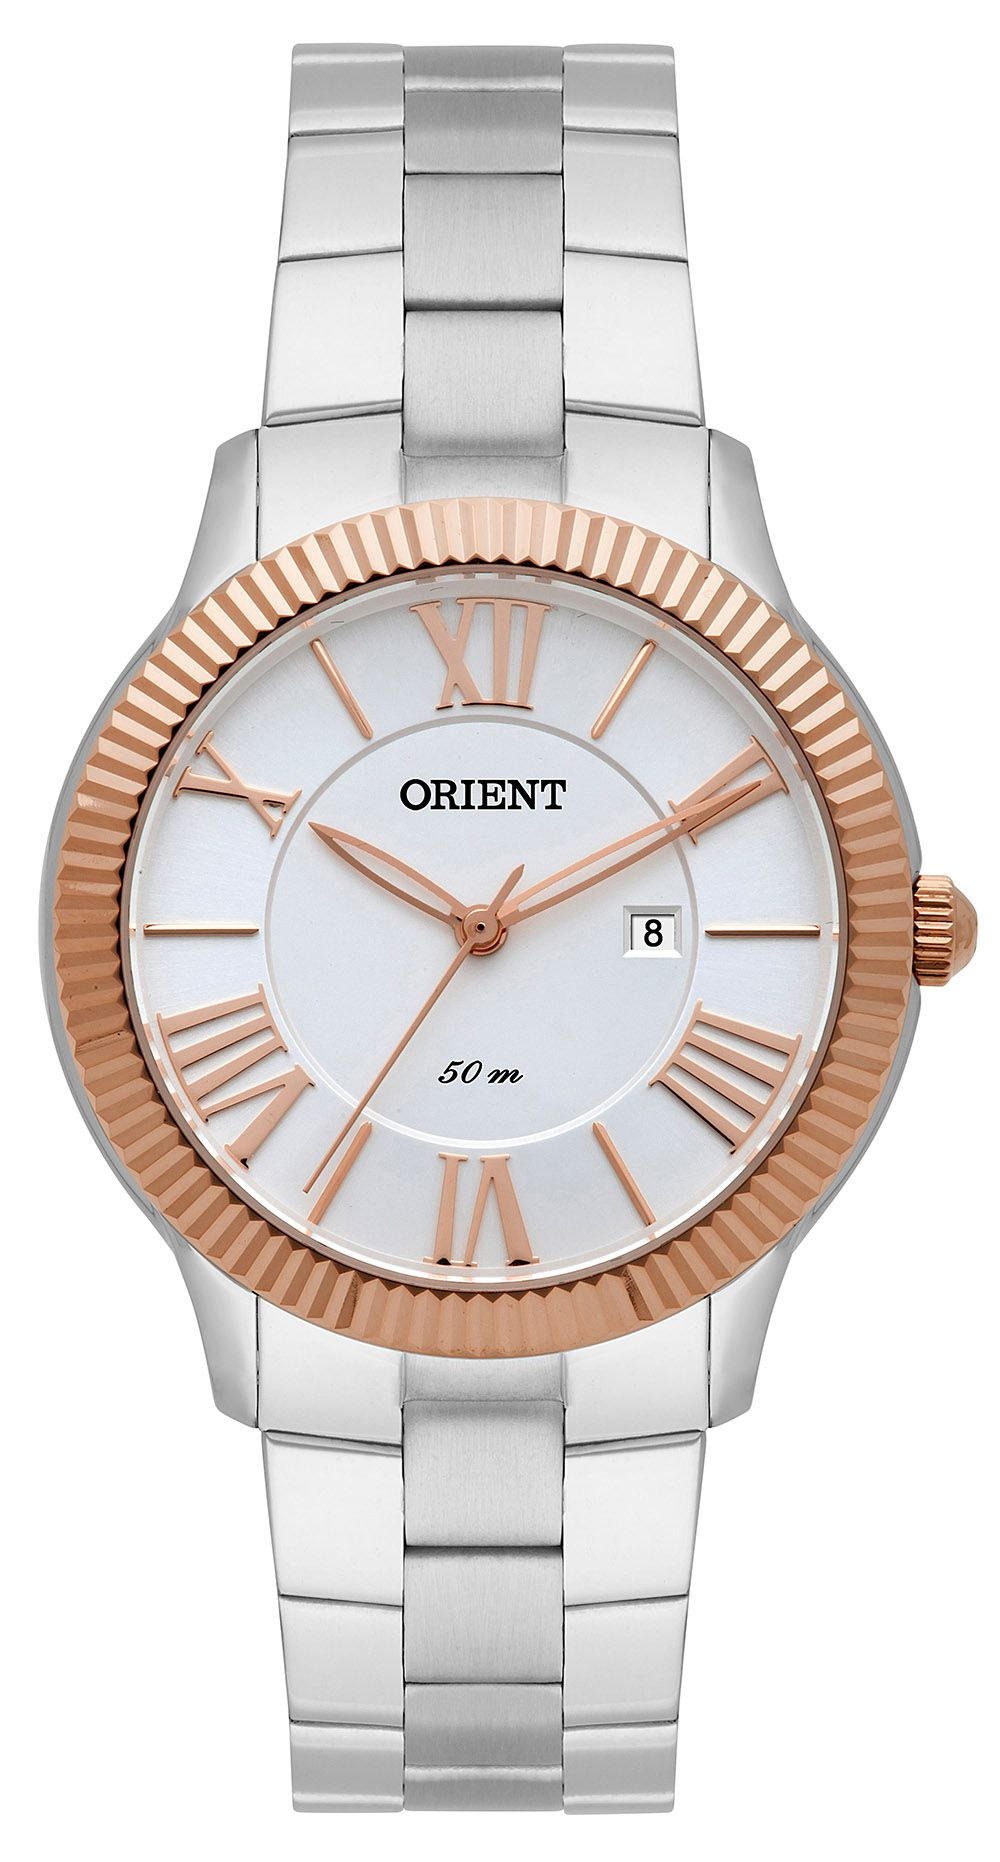 Relógio Feminino Casual Prata FTSS1108-S3SX Orient